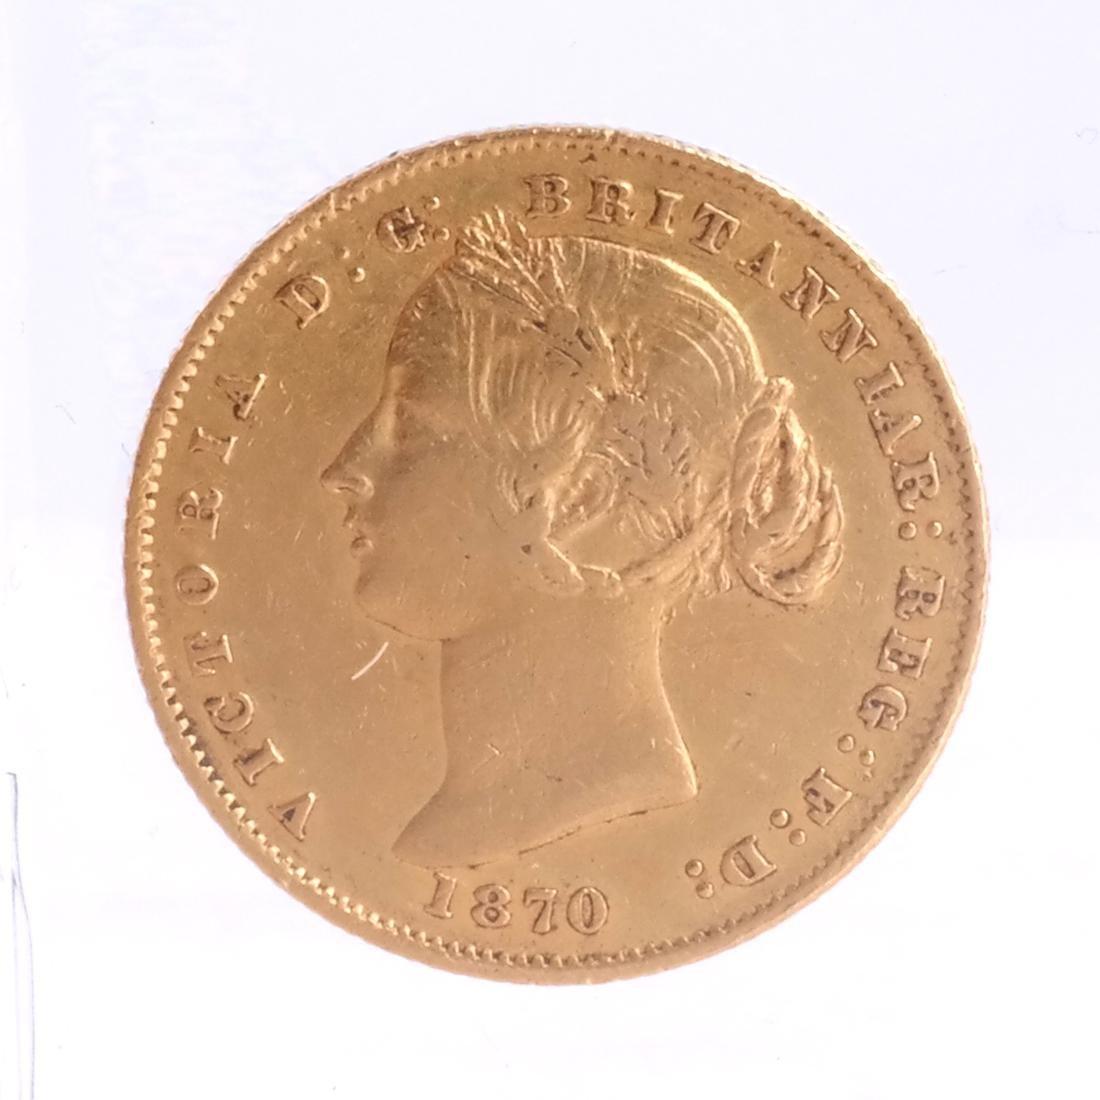 2 Gold, 10 Corona Austria, 1 Australia - 2